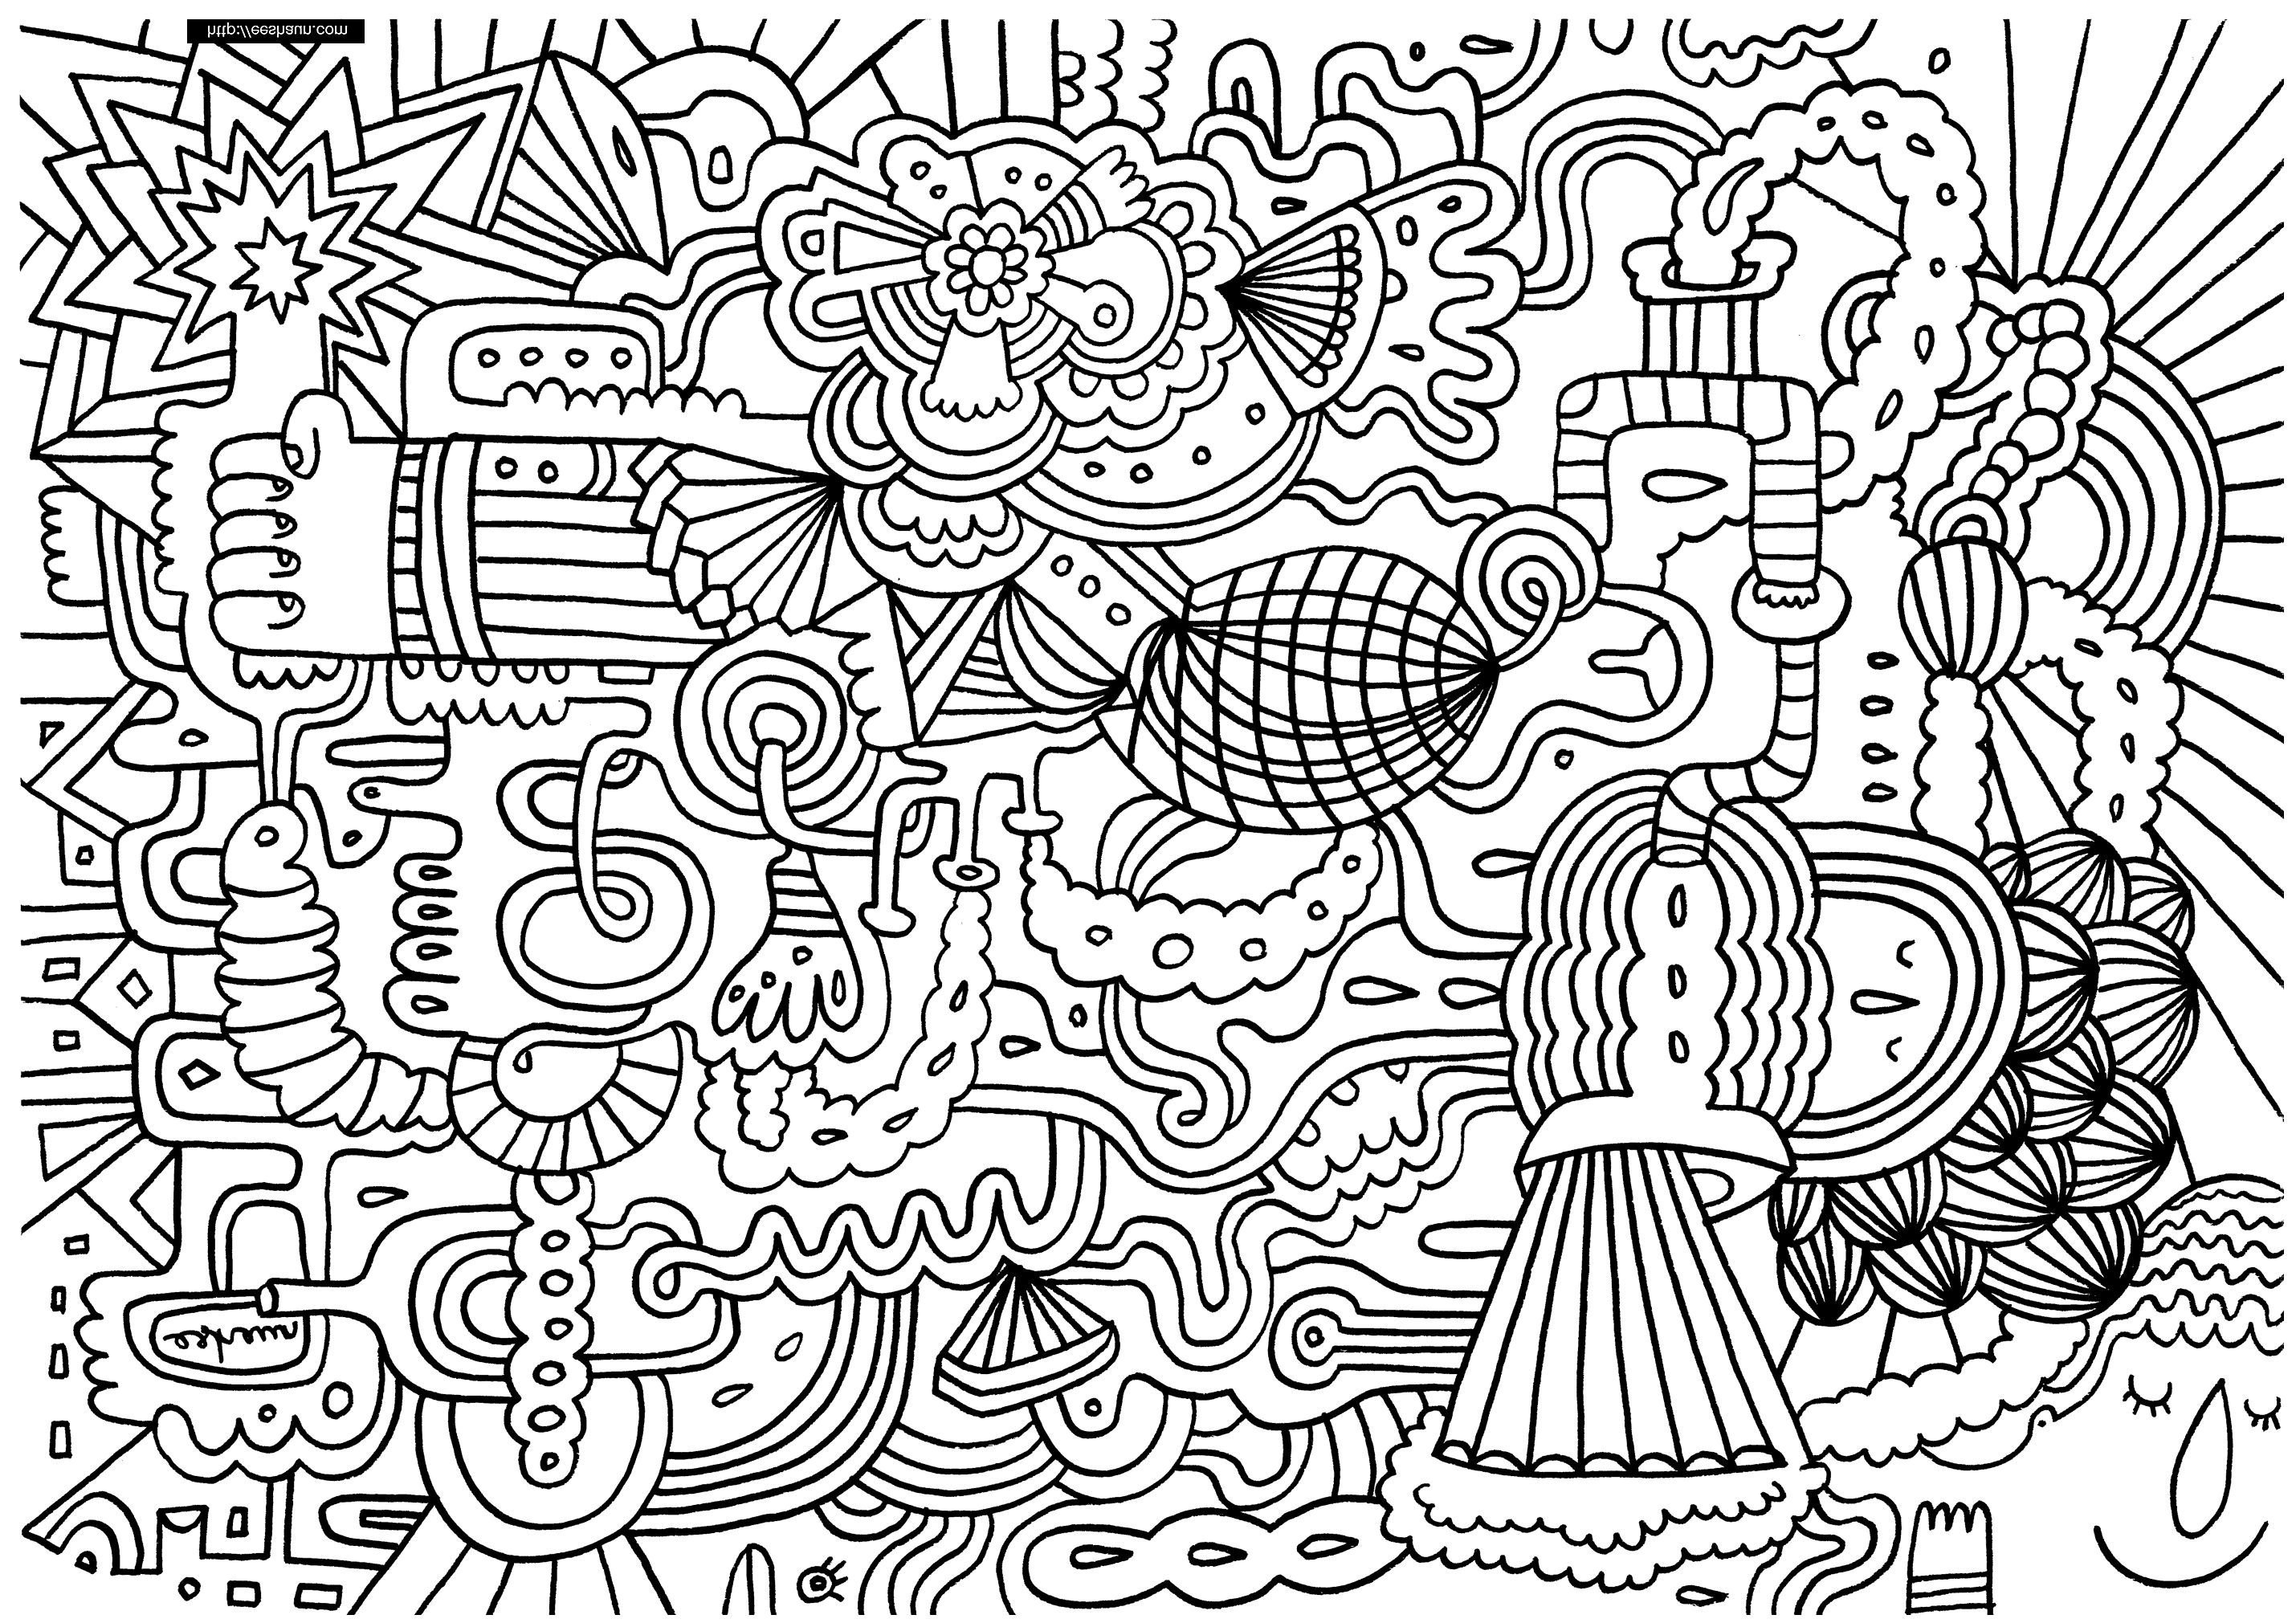 Free Coloring Pages Danaclarkcolors Com Coloring Pages For Girls Coloring Pages For Boys Coloring Books